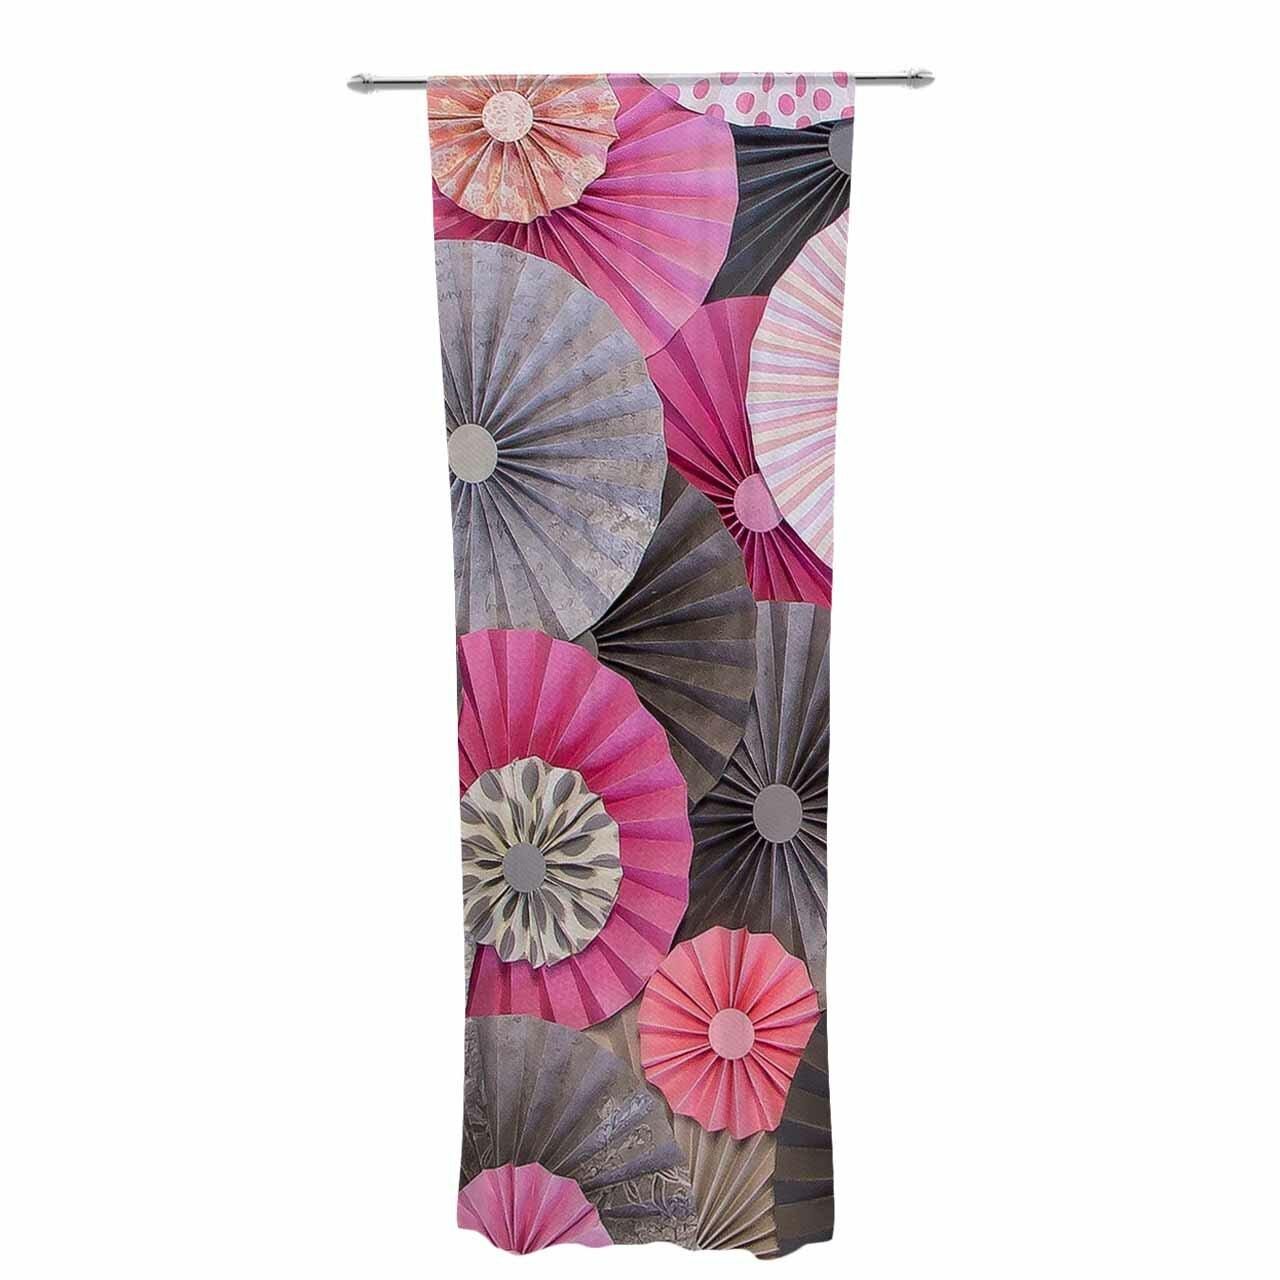 East Urban Home Heidi Jennings Bubble Gum Decorative Graphic Print Text Sheer Rod Pocket Curtain Panels Wayfair